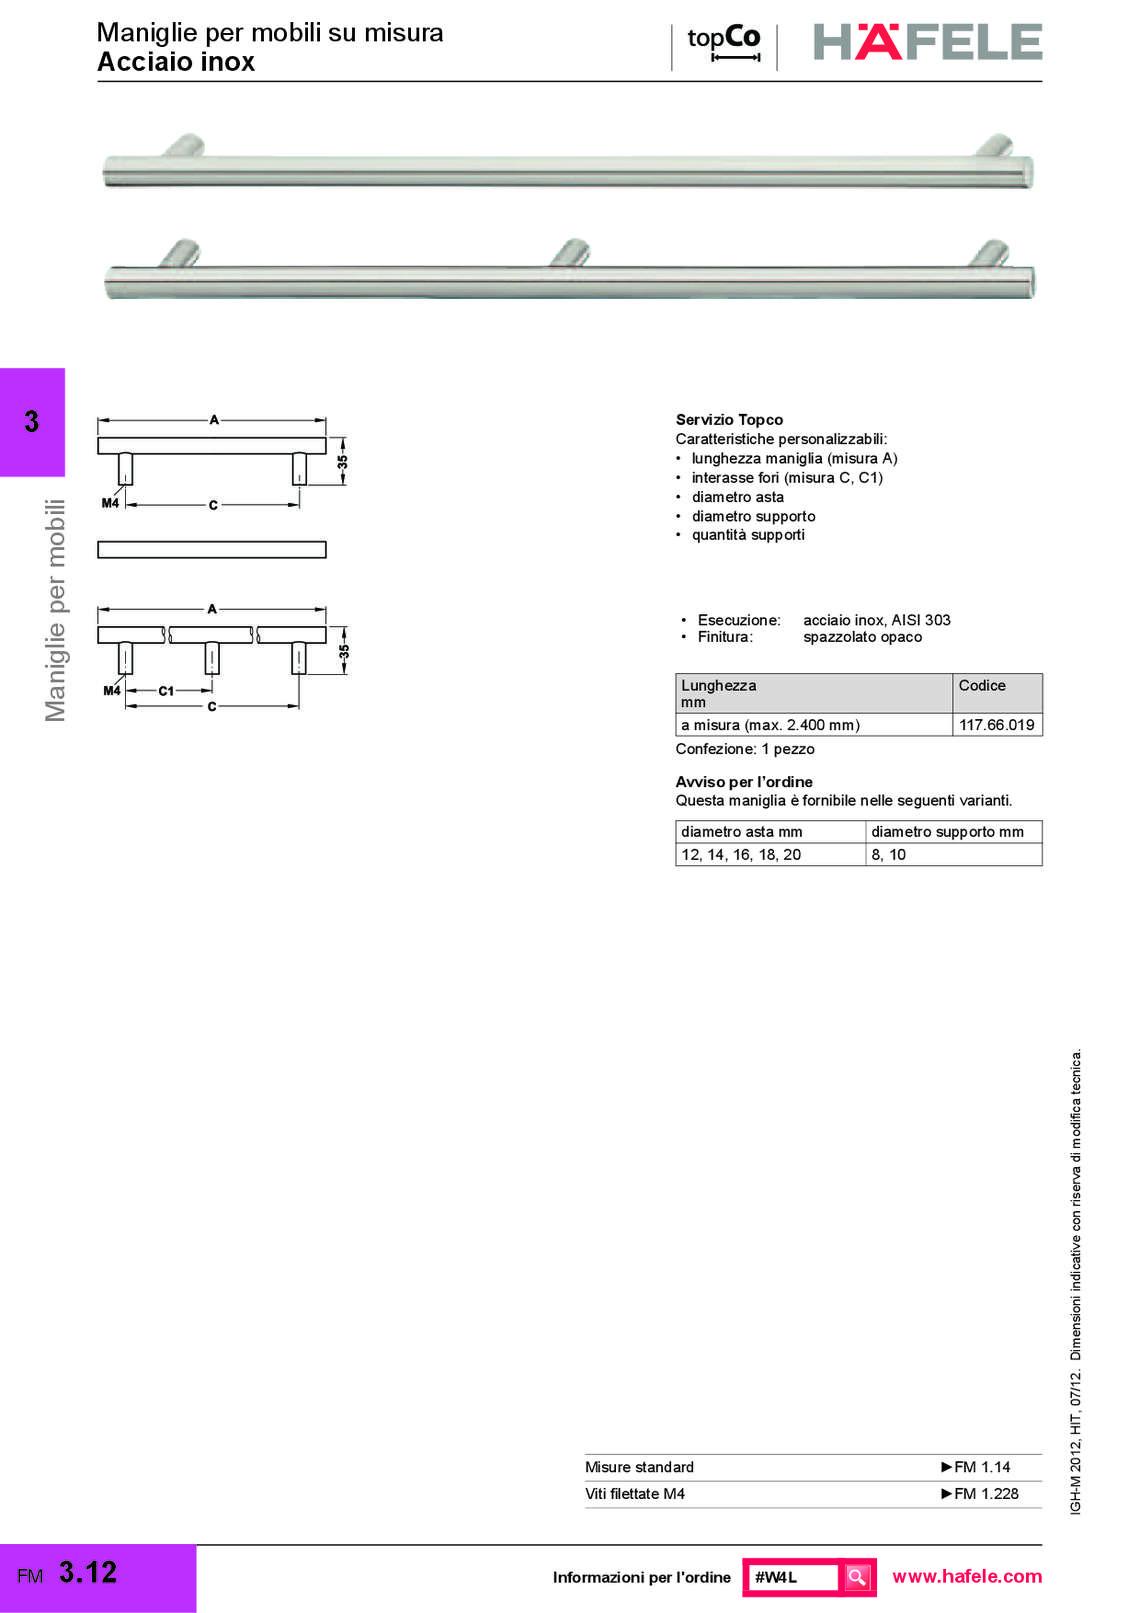 hafele-prodotti-su-misura_81_021.jpg